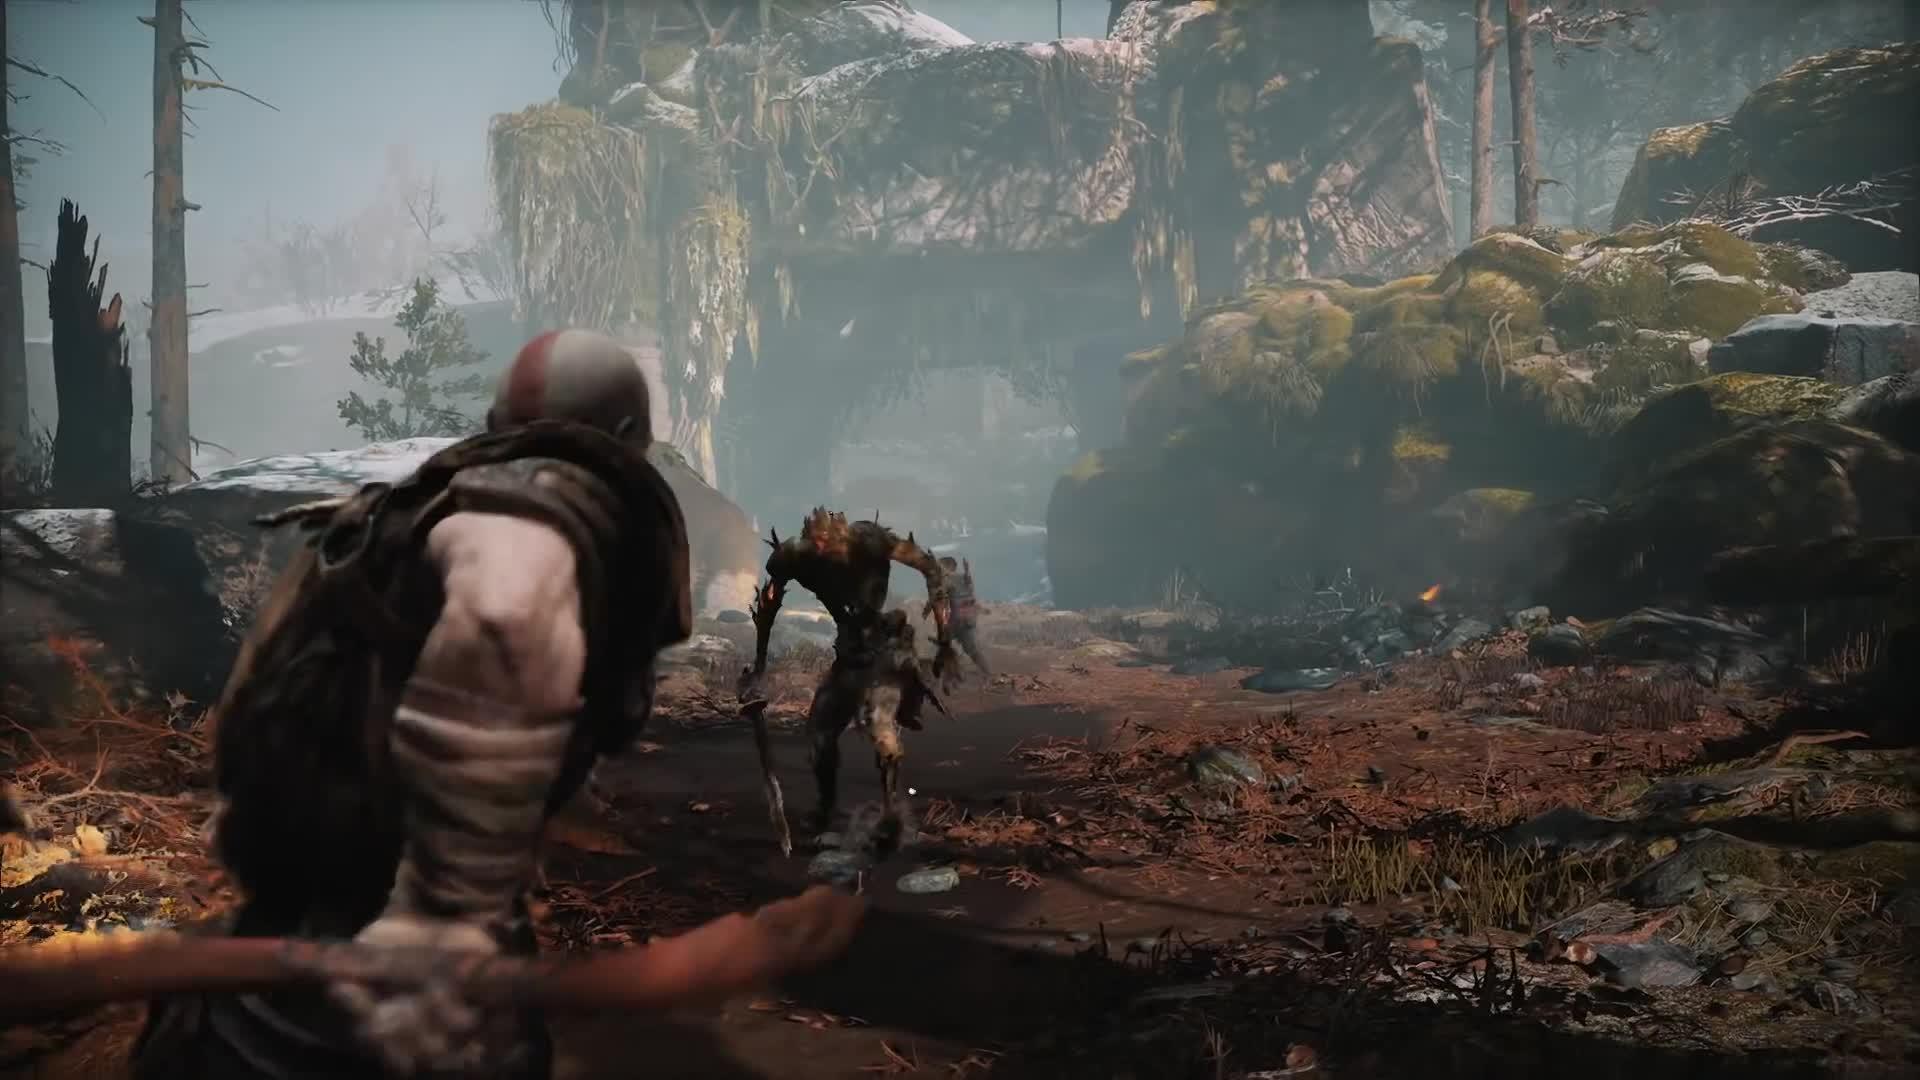 Atreus, Cory Barlog, E3, E3 2017, Gameplay, God of War, Incredible, Kratos, Mythology, Norse, player.one, playerdotone, God of War – Story Trailer | PS4 GIFs